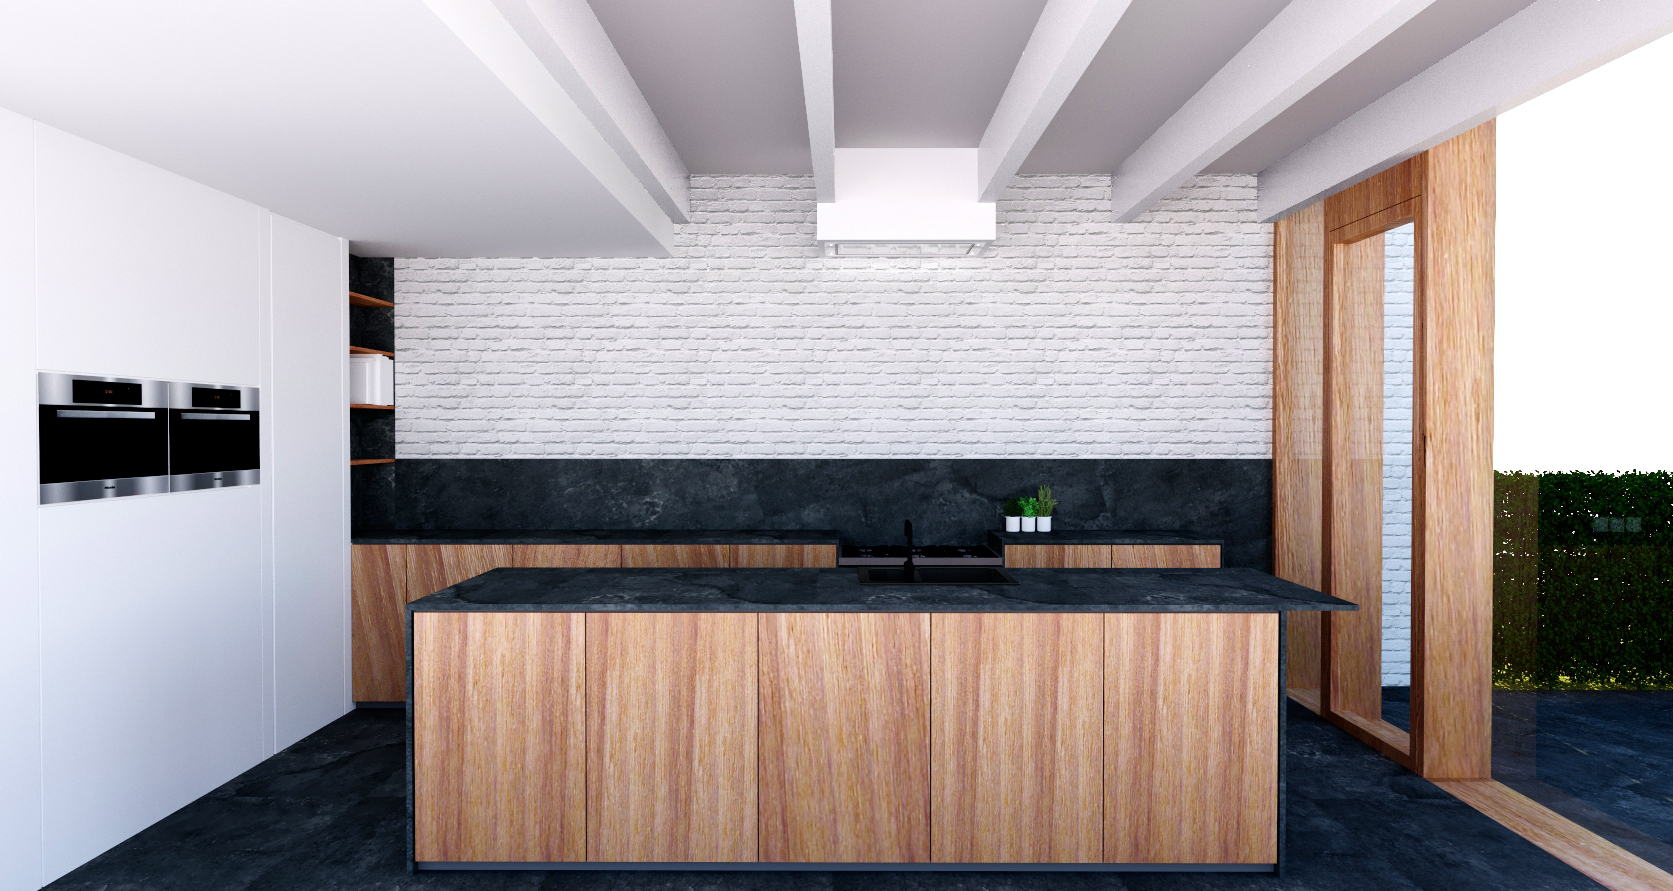 faktordertig - architectuur - uitbreiding - renovatie - Lier - Antwerpen - interieurarchitectuur